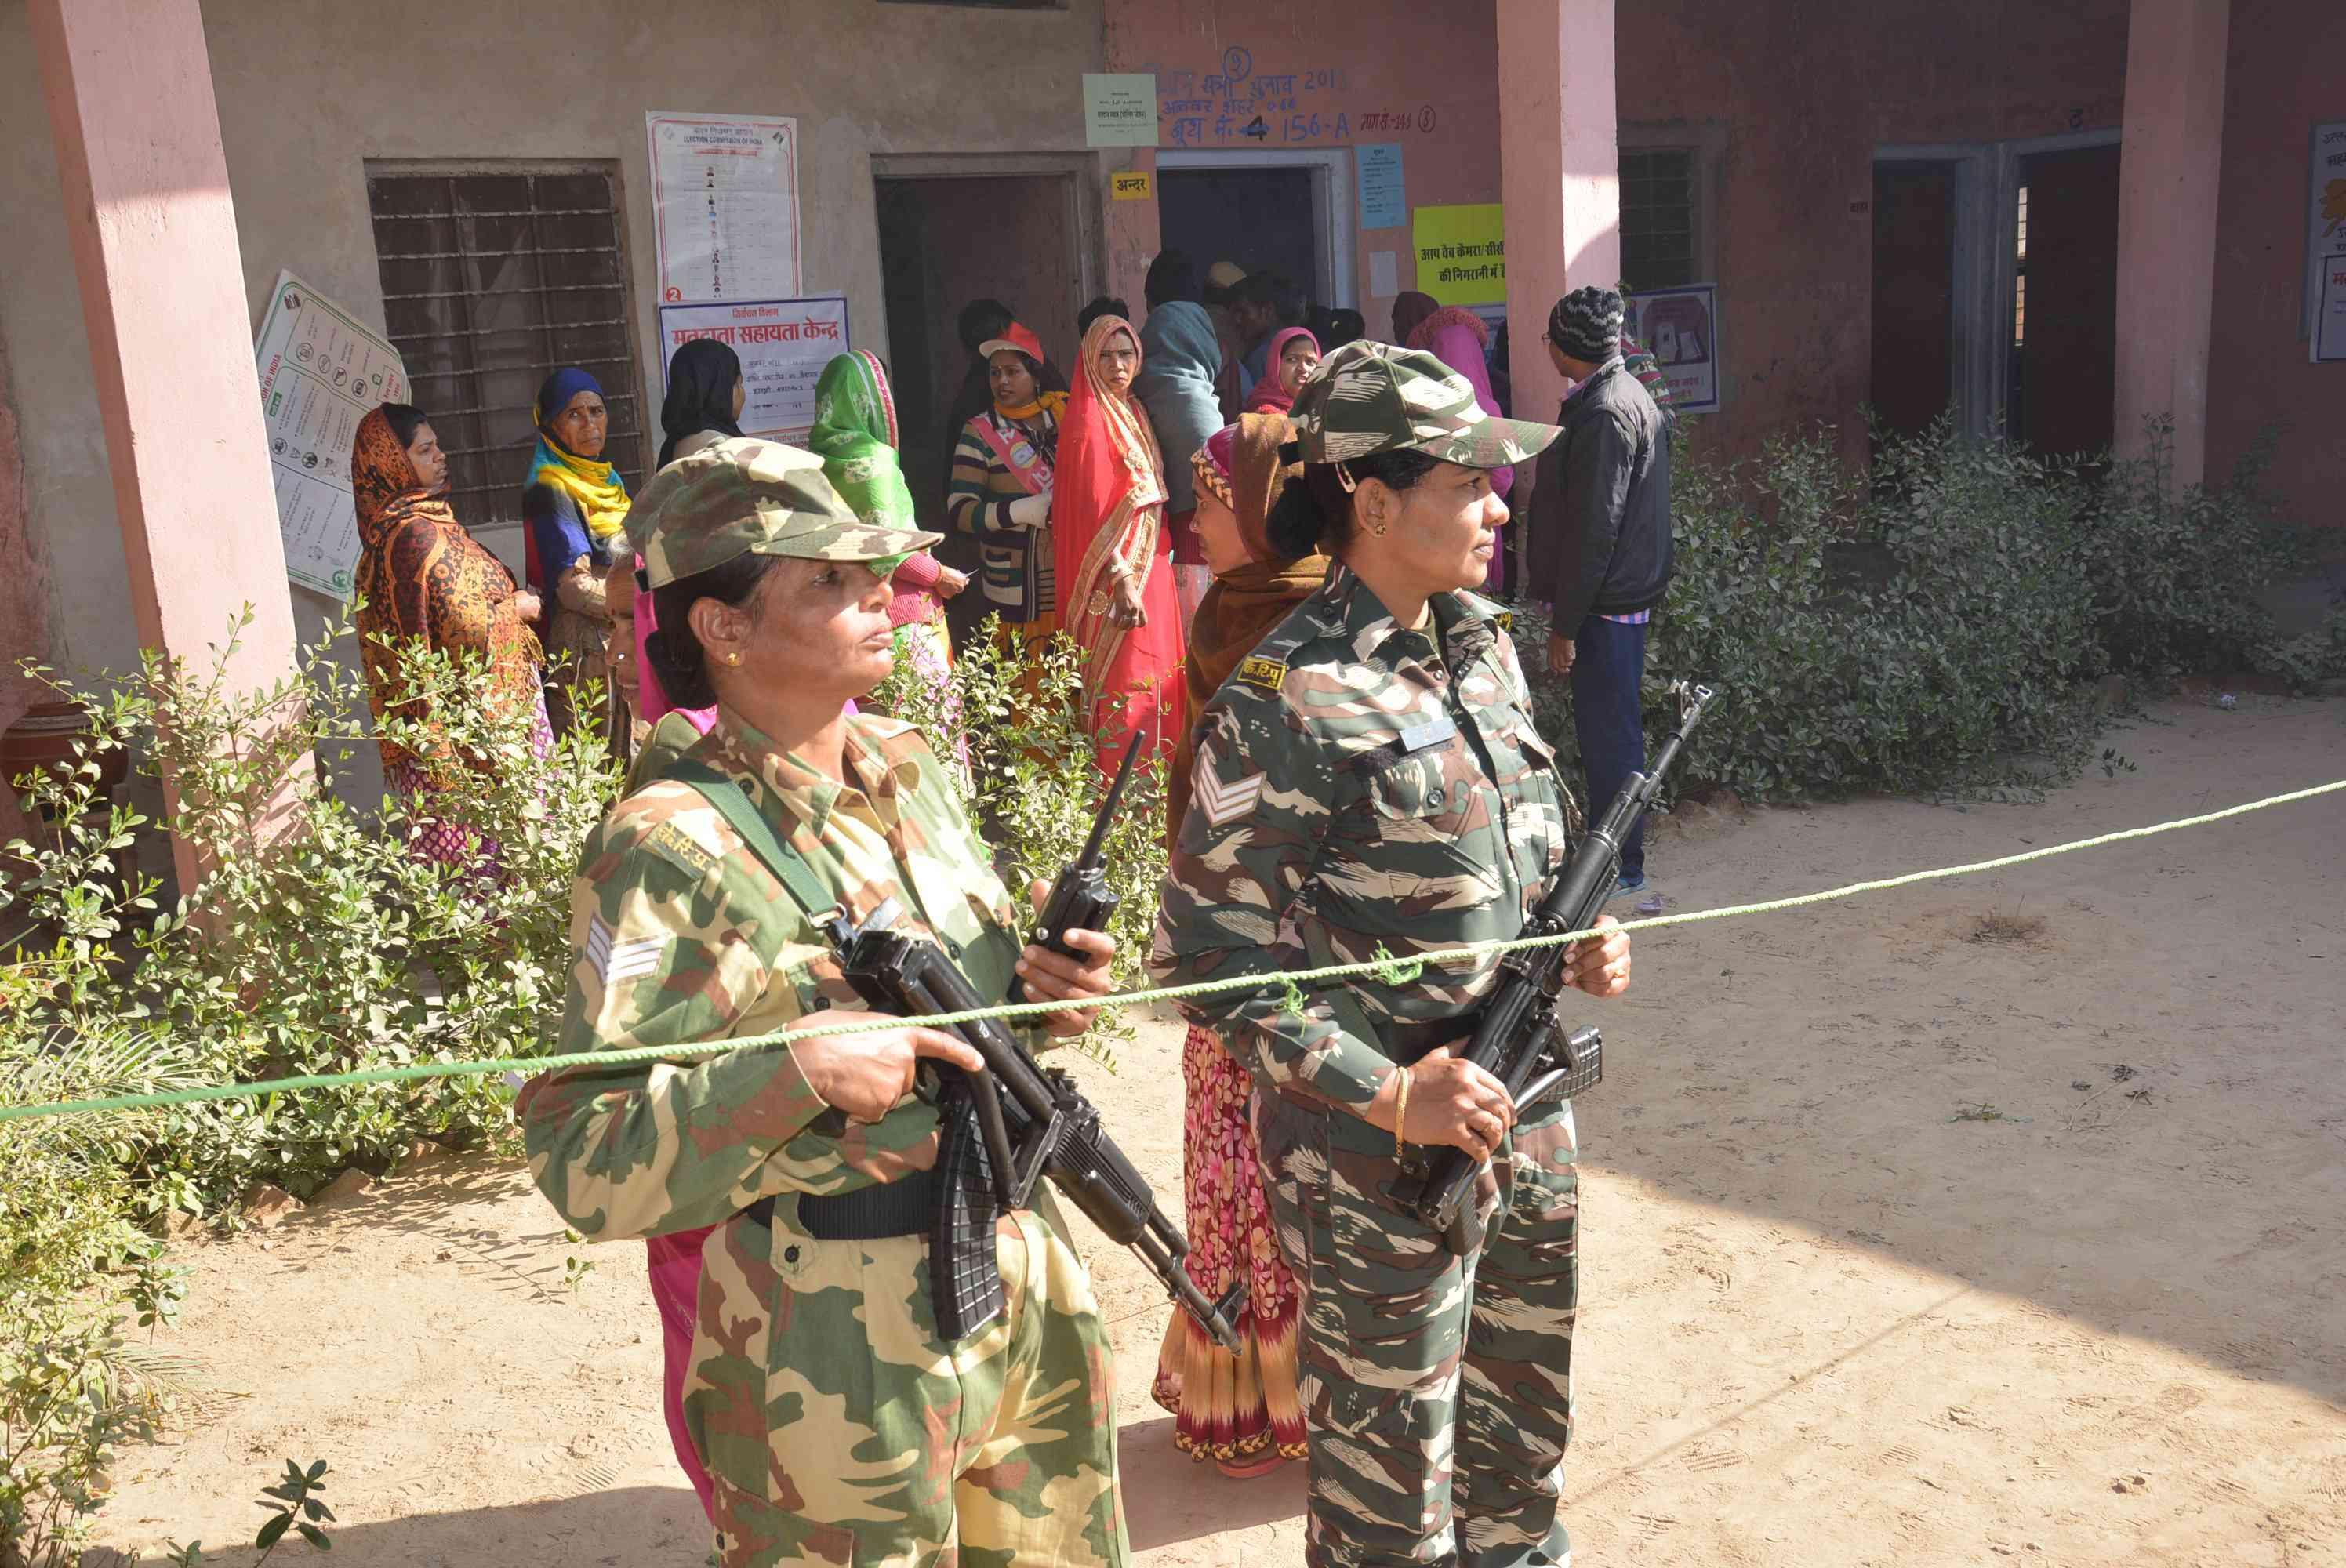 police security was good in alwar loksabha elections